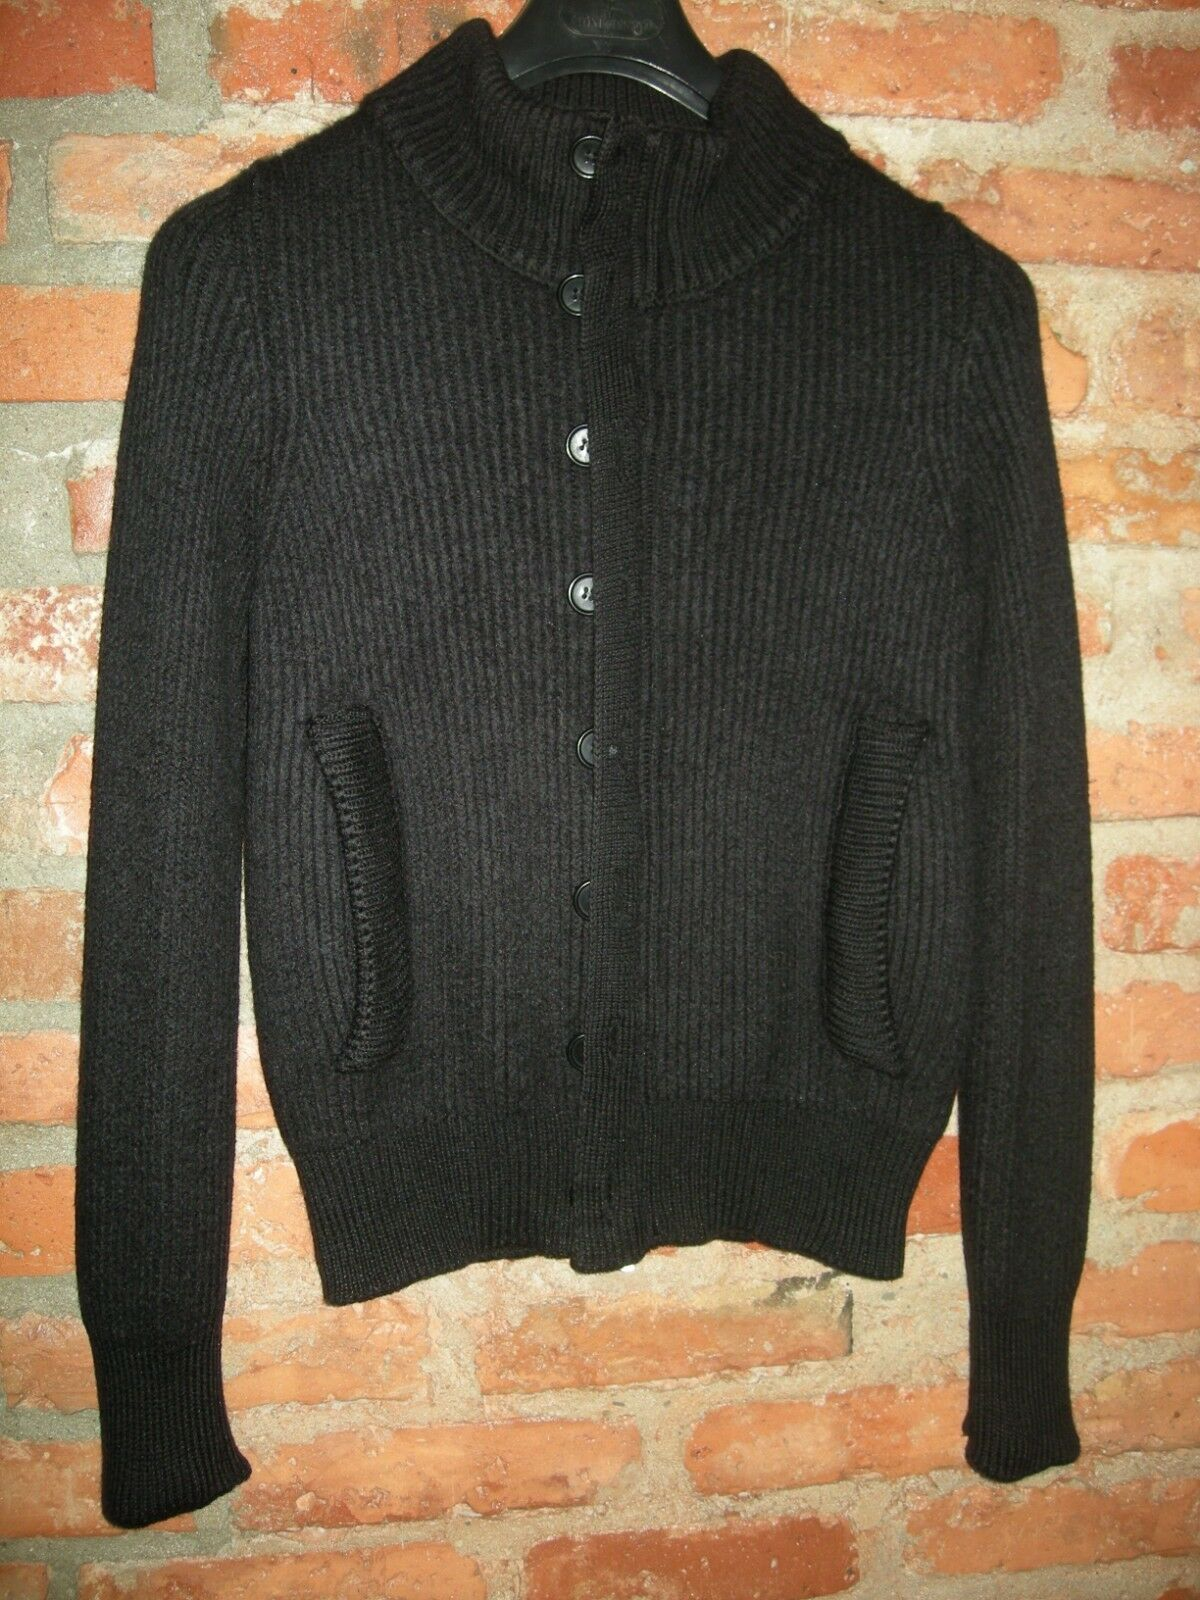 Cp company stone island vintage maglione felpa maglia voituredigan chandail